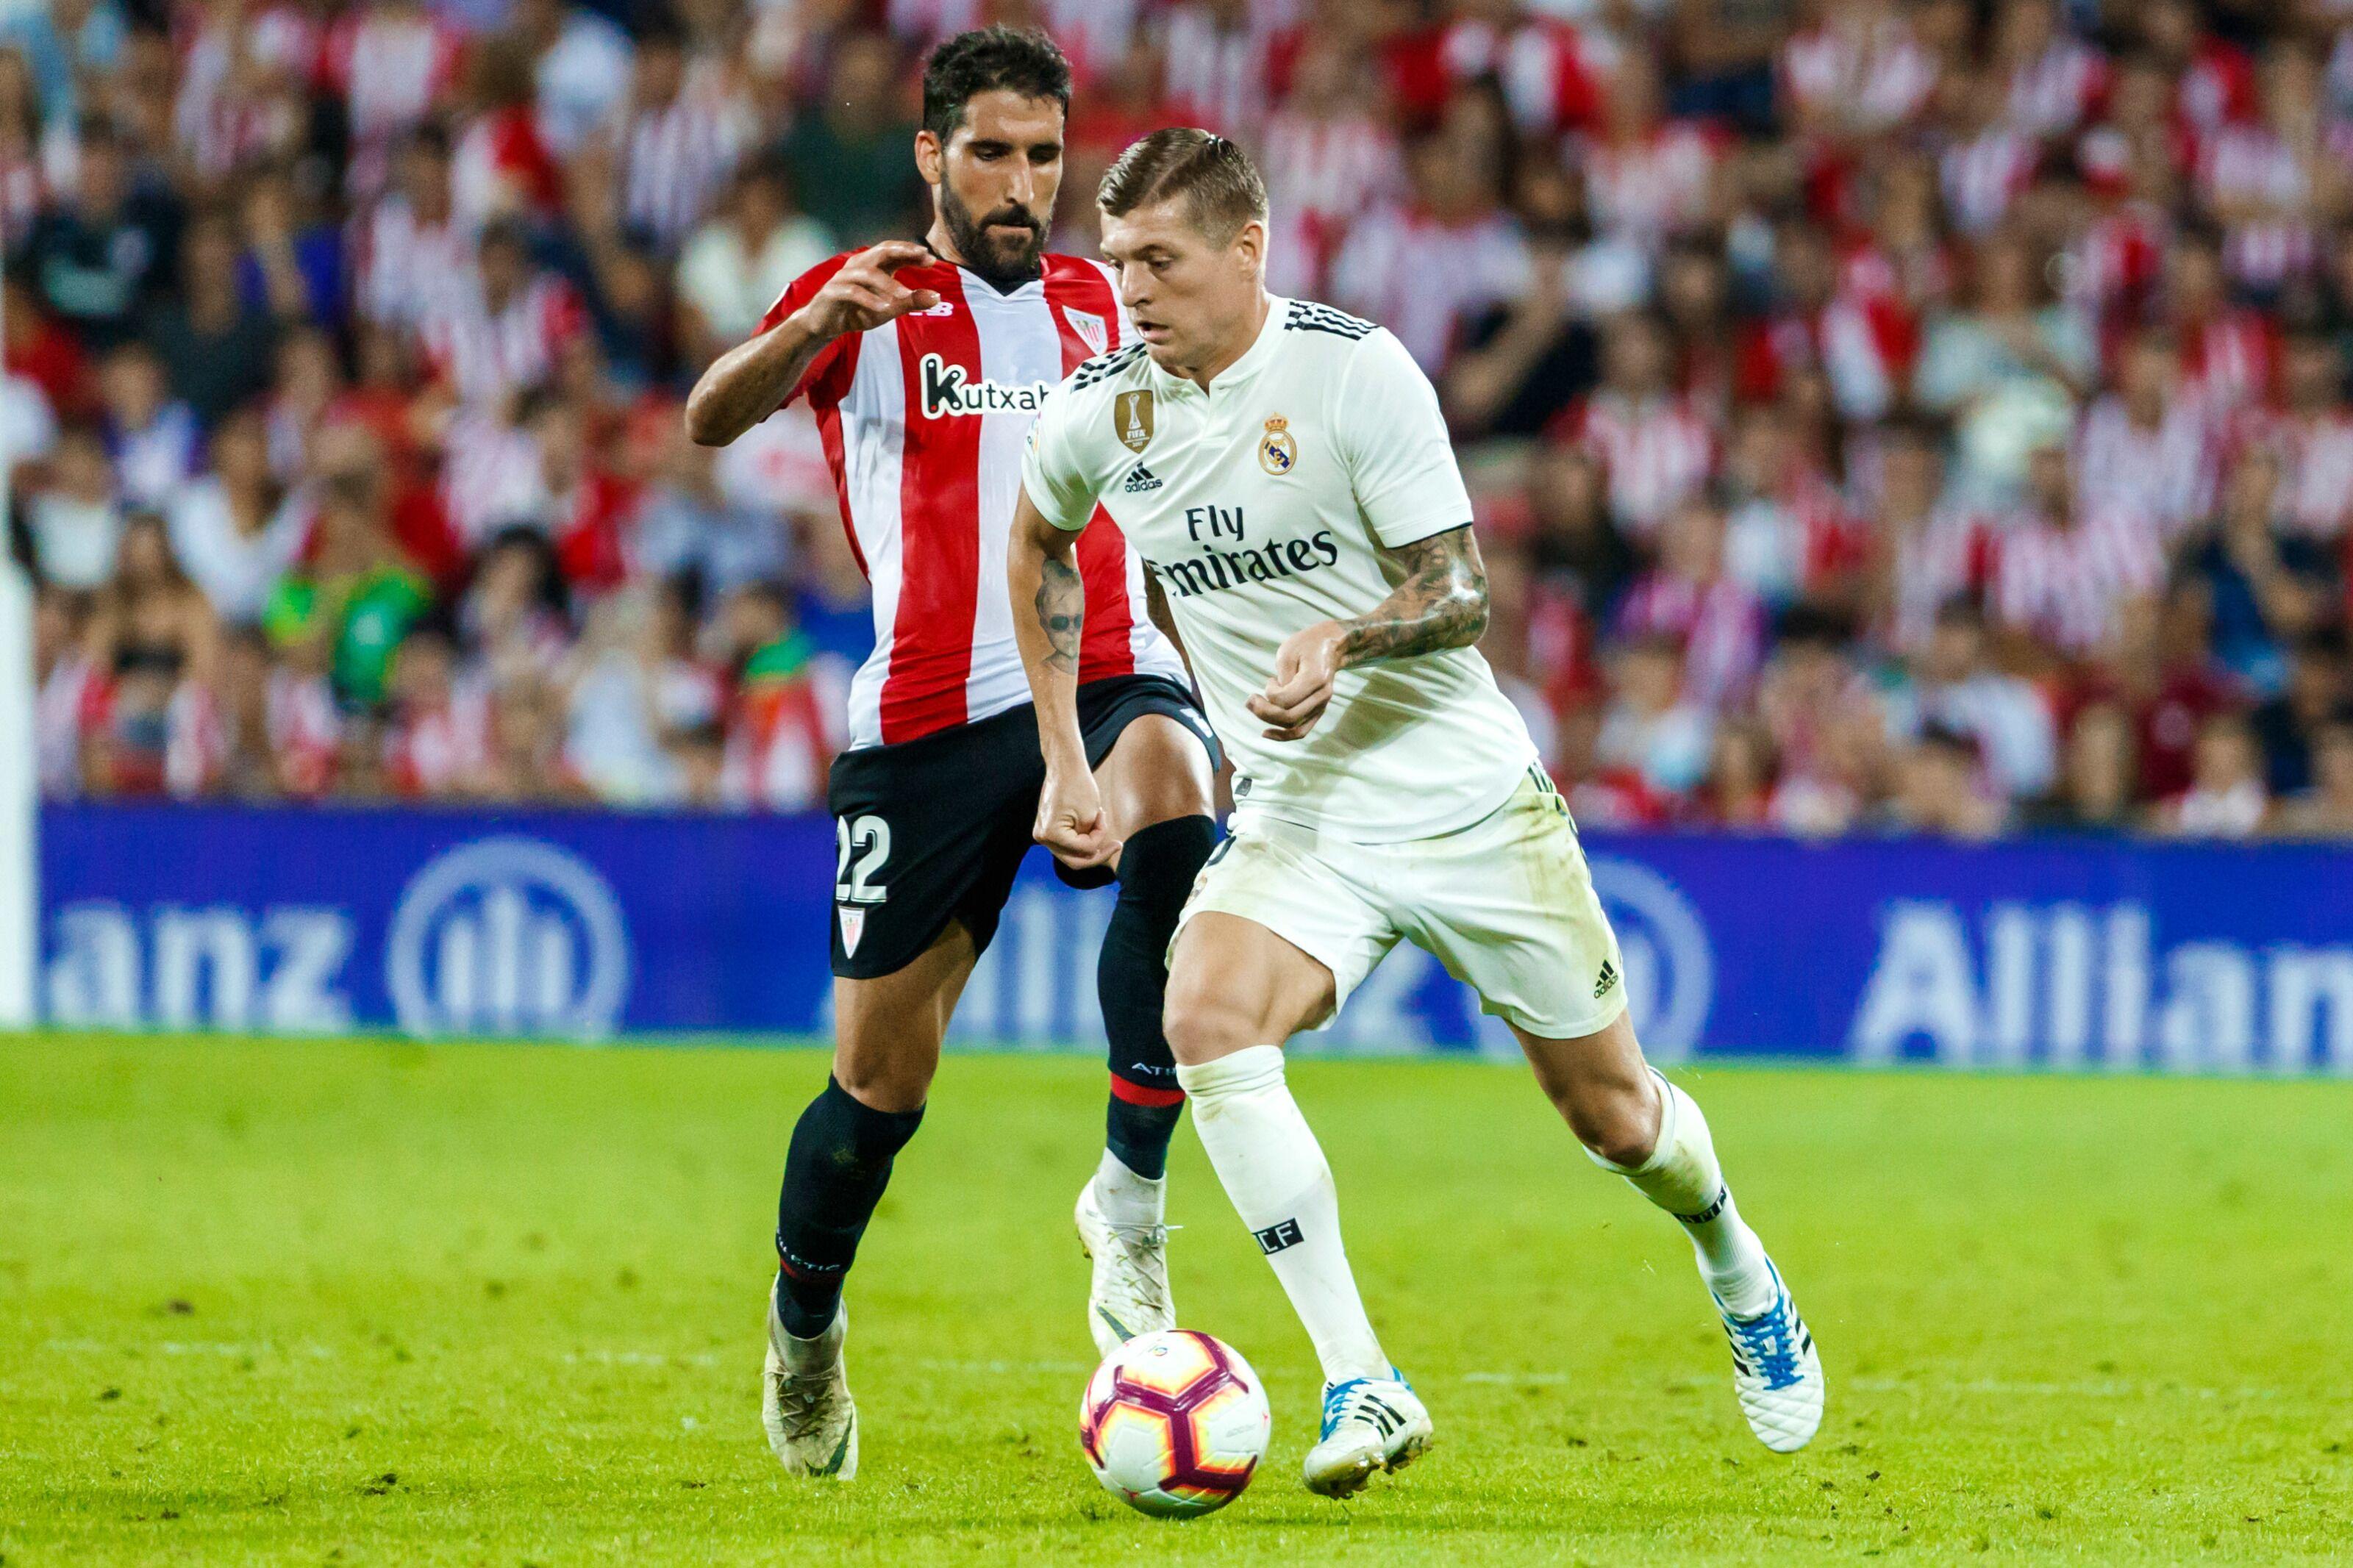 La Liga: Previewing Real Madrid vs. Athletic Bilbao